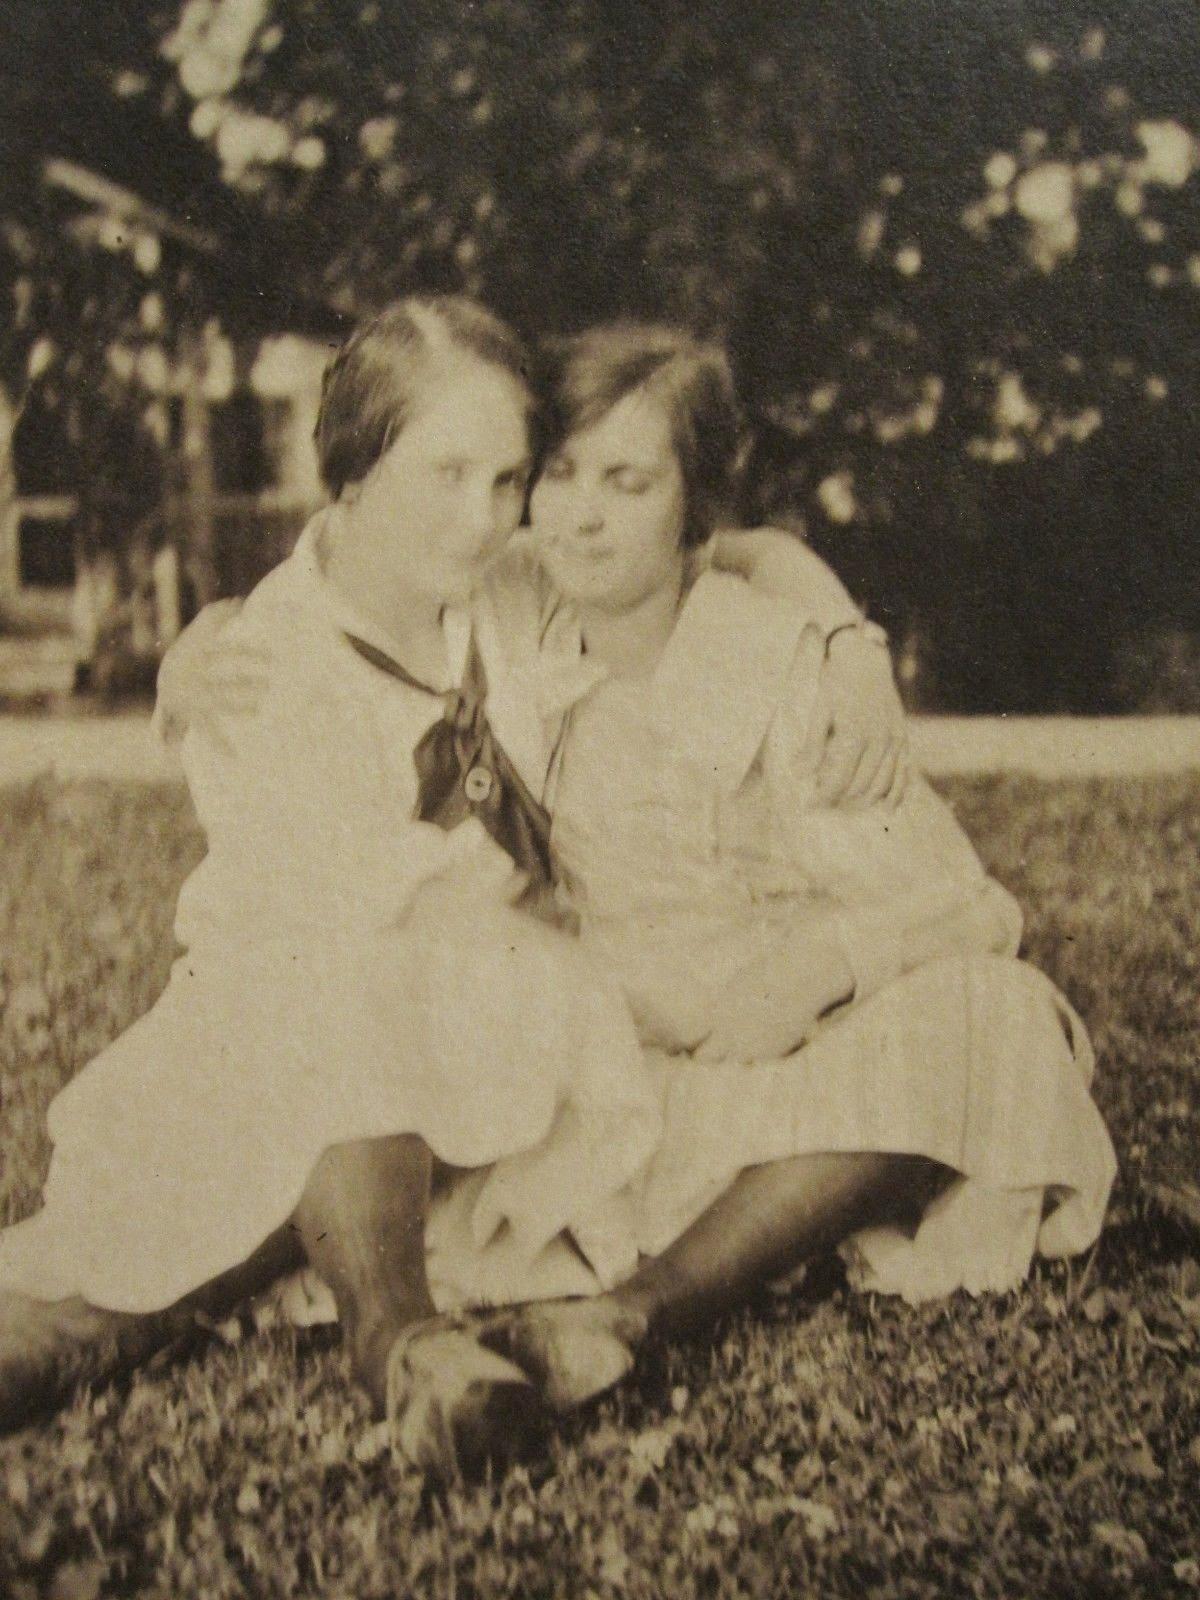 Lesbians living together in cedar rapids iowa apartment - 5 1